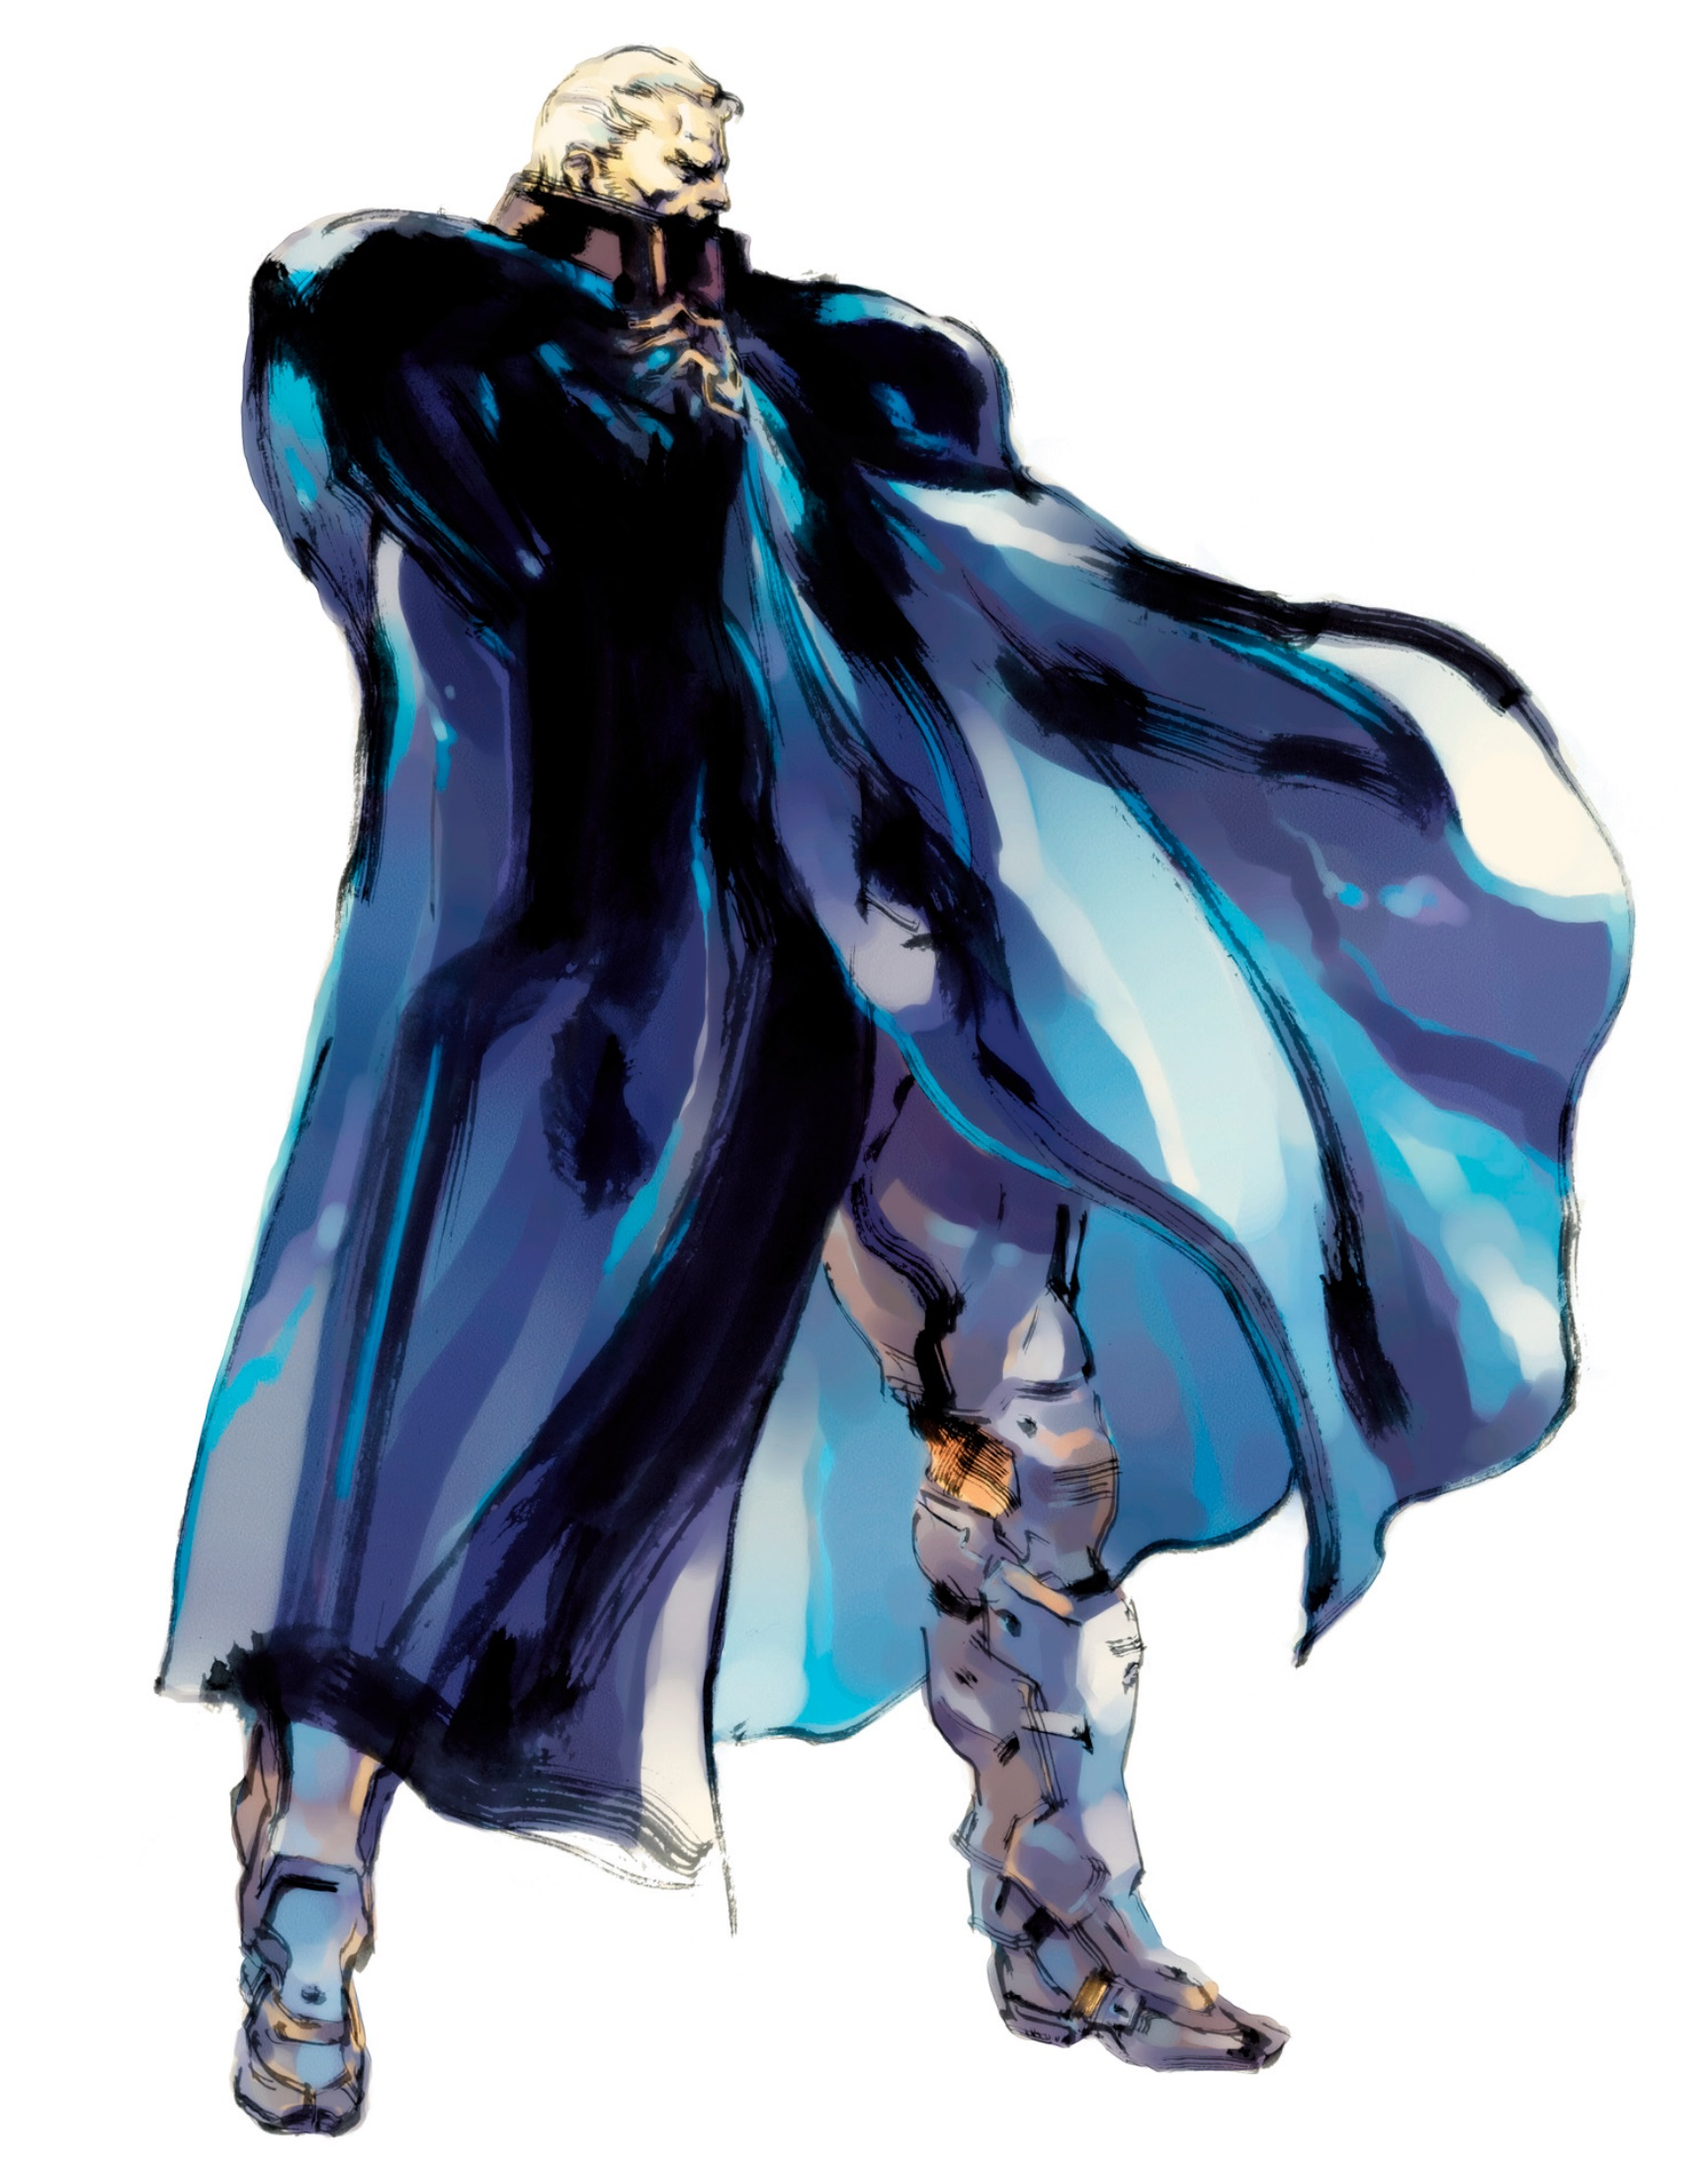 Metal_Gear_Solid_2_Cast_Solidus_Snake.jp